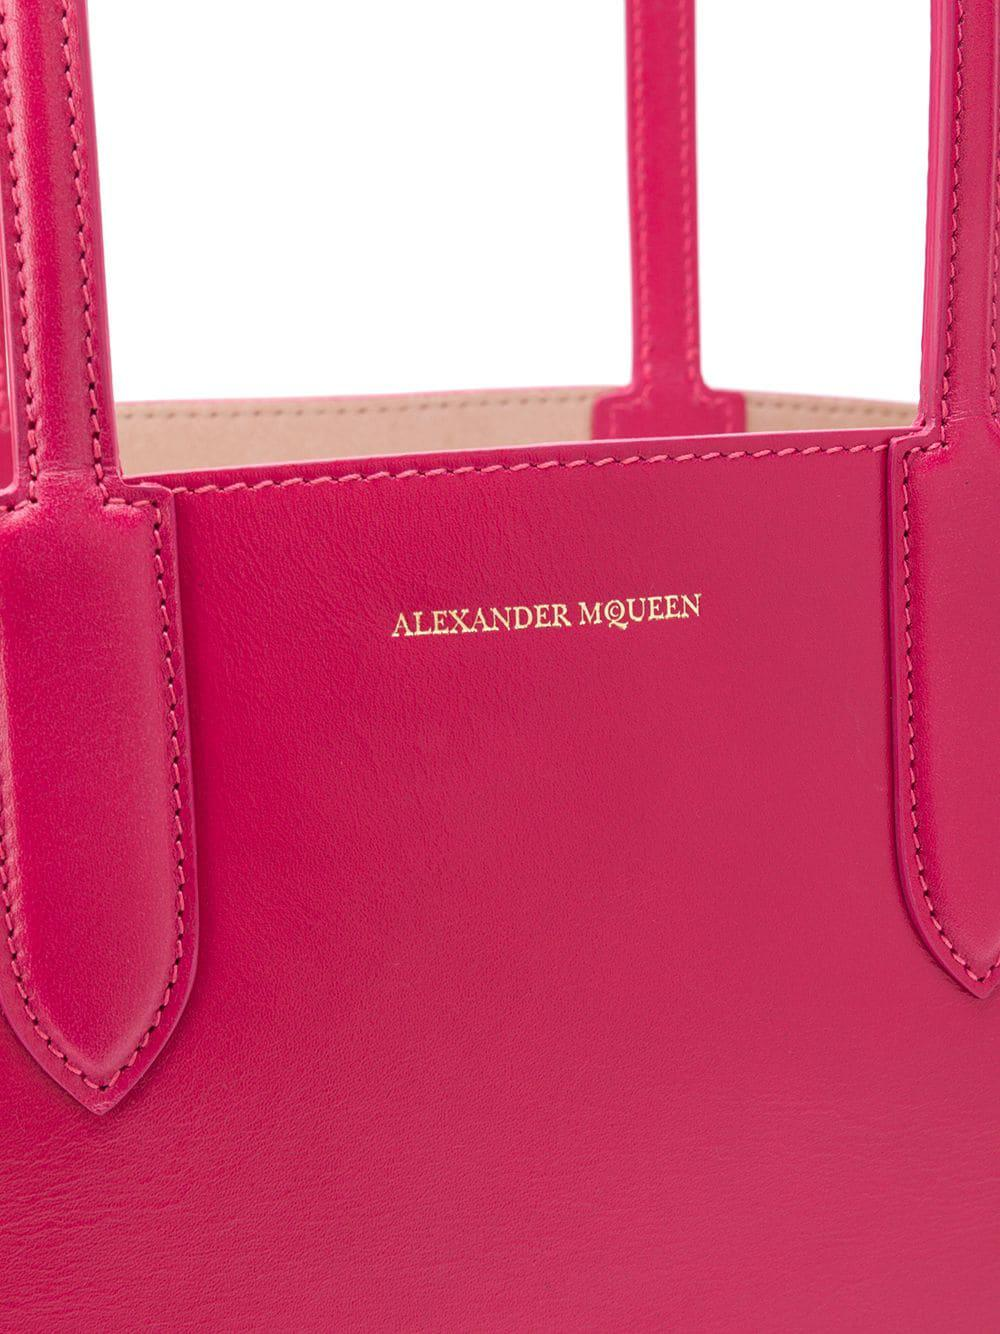 Alexander McQueen Shopper Tote in Pink